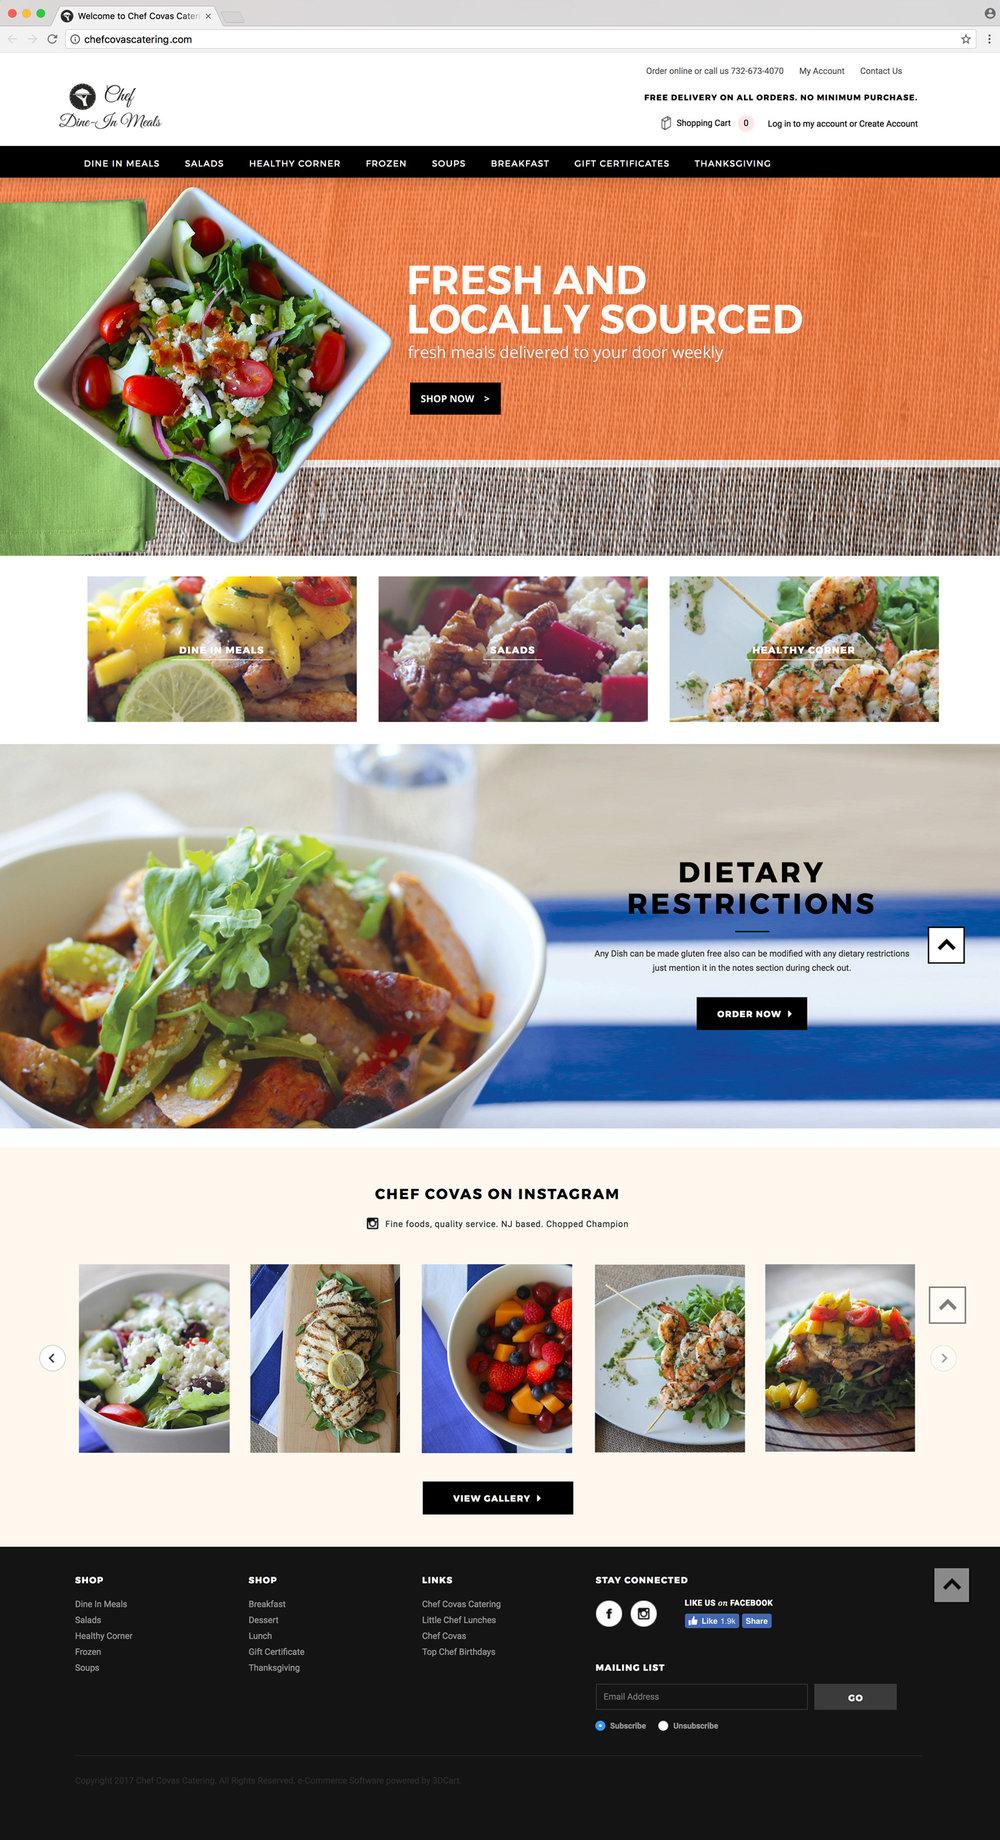 ChefCovas_homepage.jpg